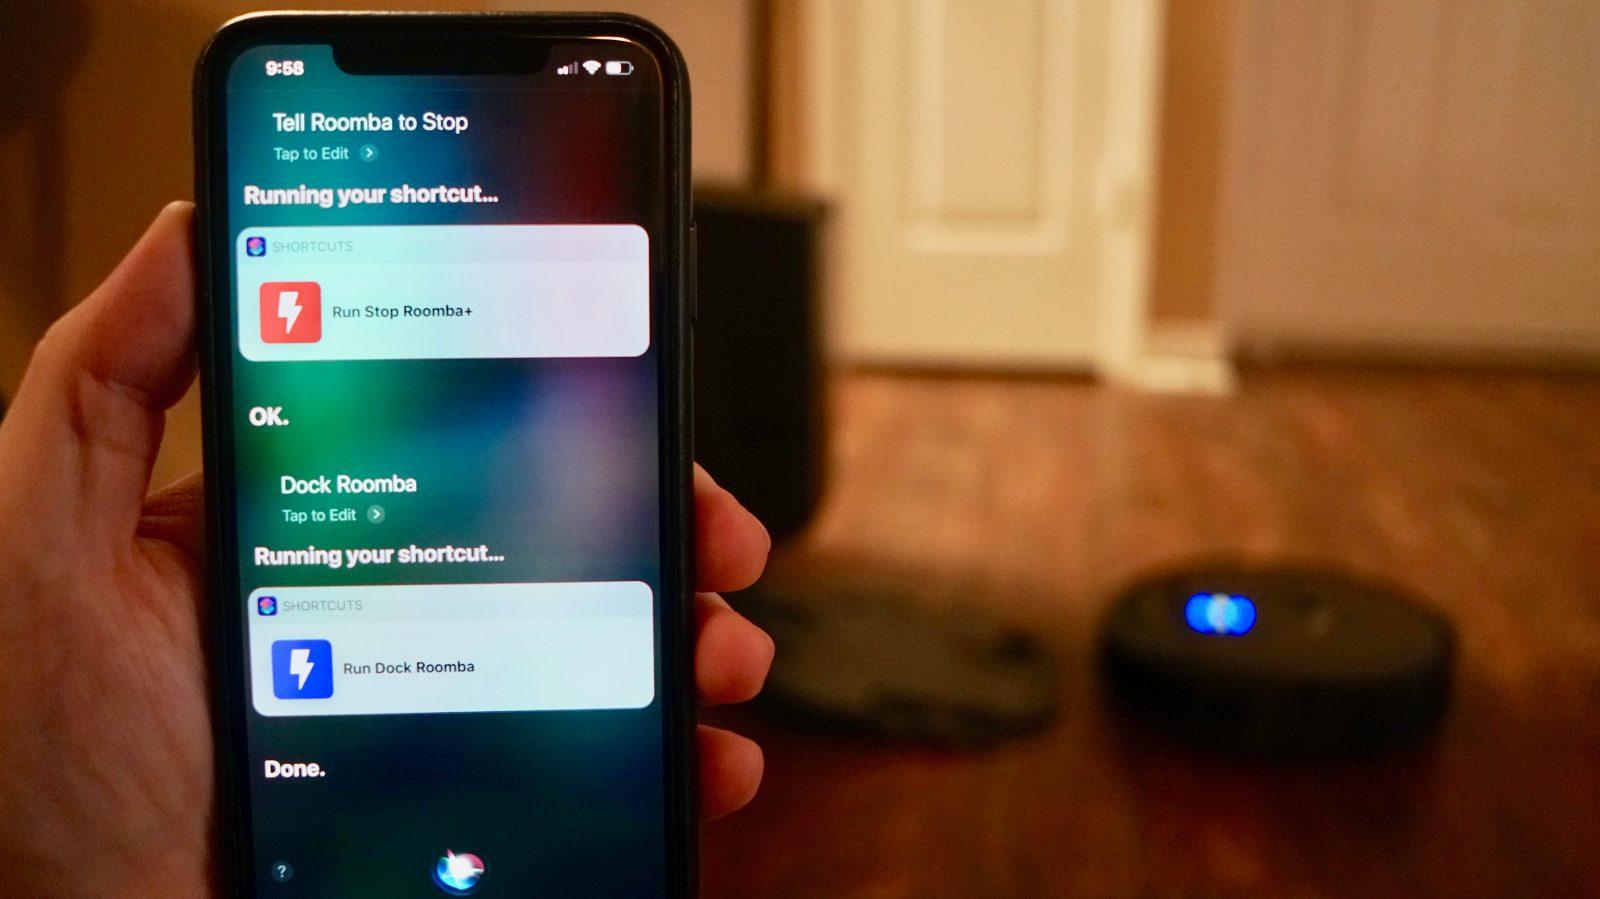 How to control iRobot Roomba with Siri, no HomeKit required